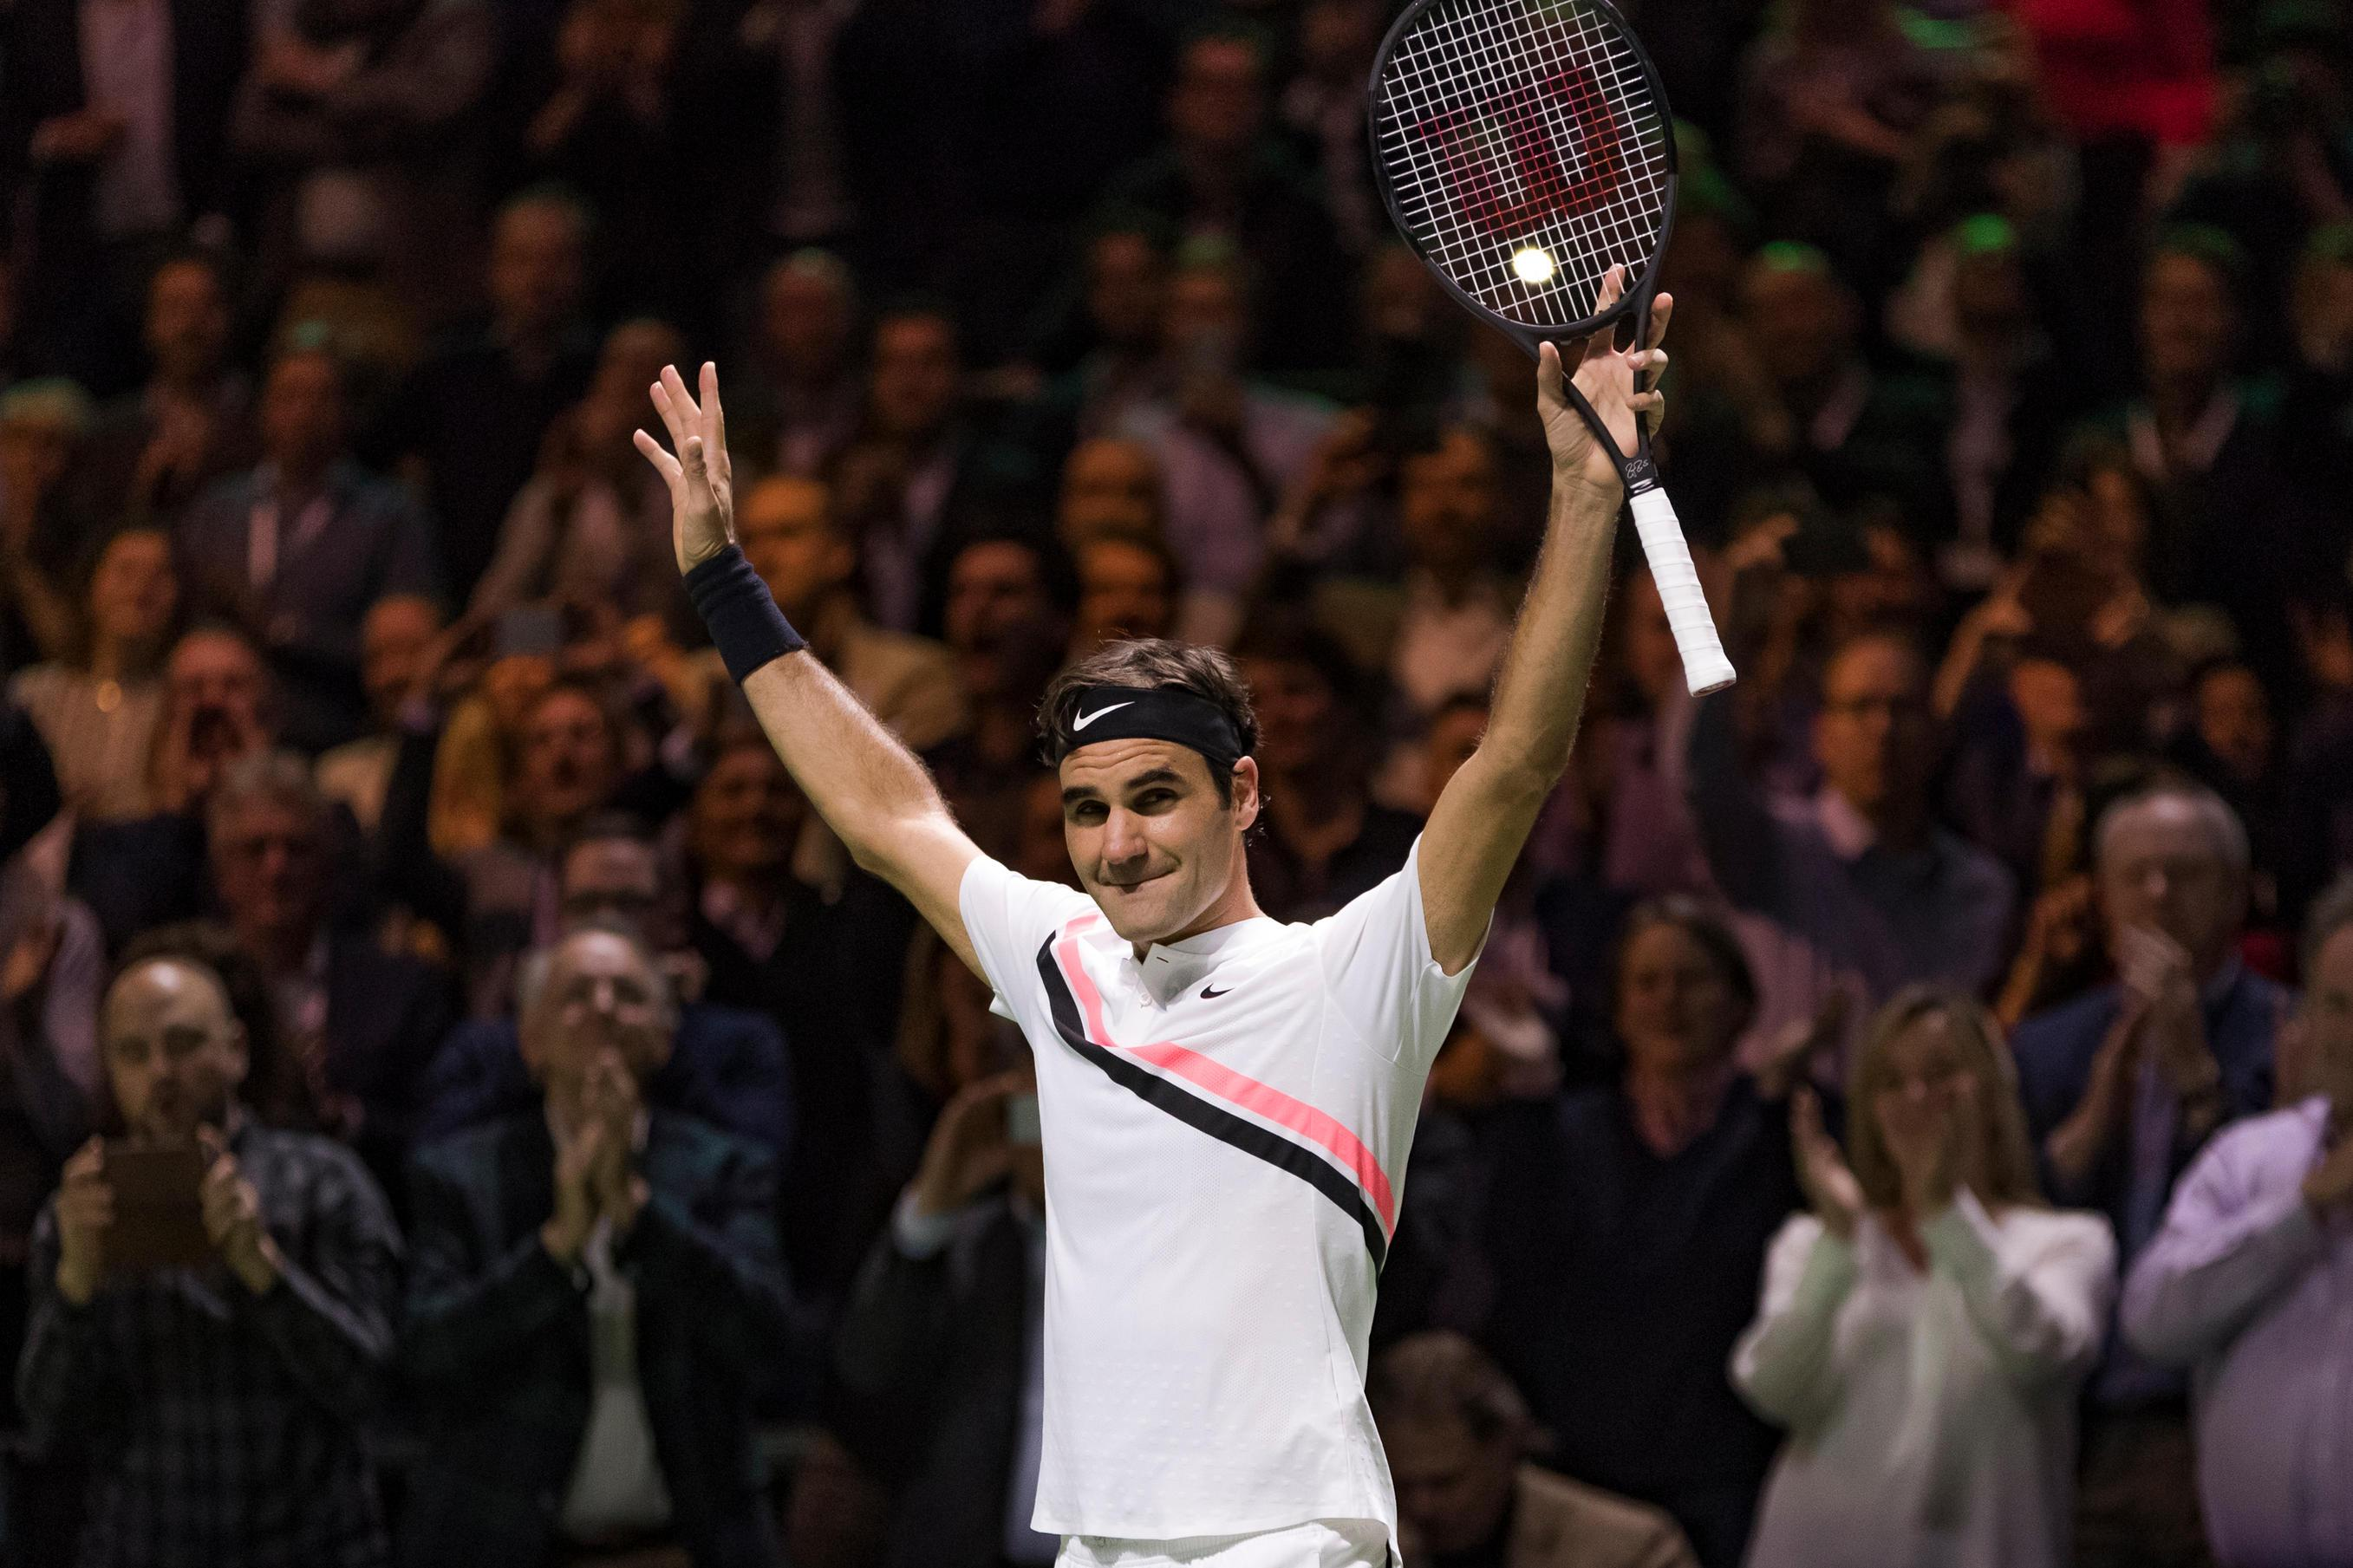 Twenty-time Grand Slam champ Roger Federer celebrates returning to the summit of the world rankings